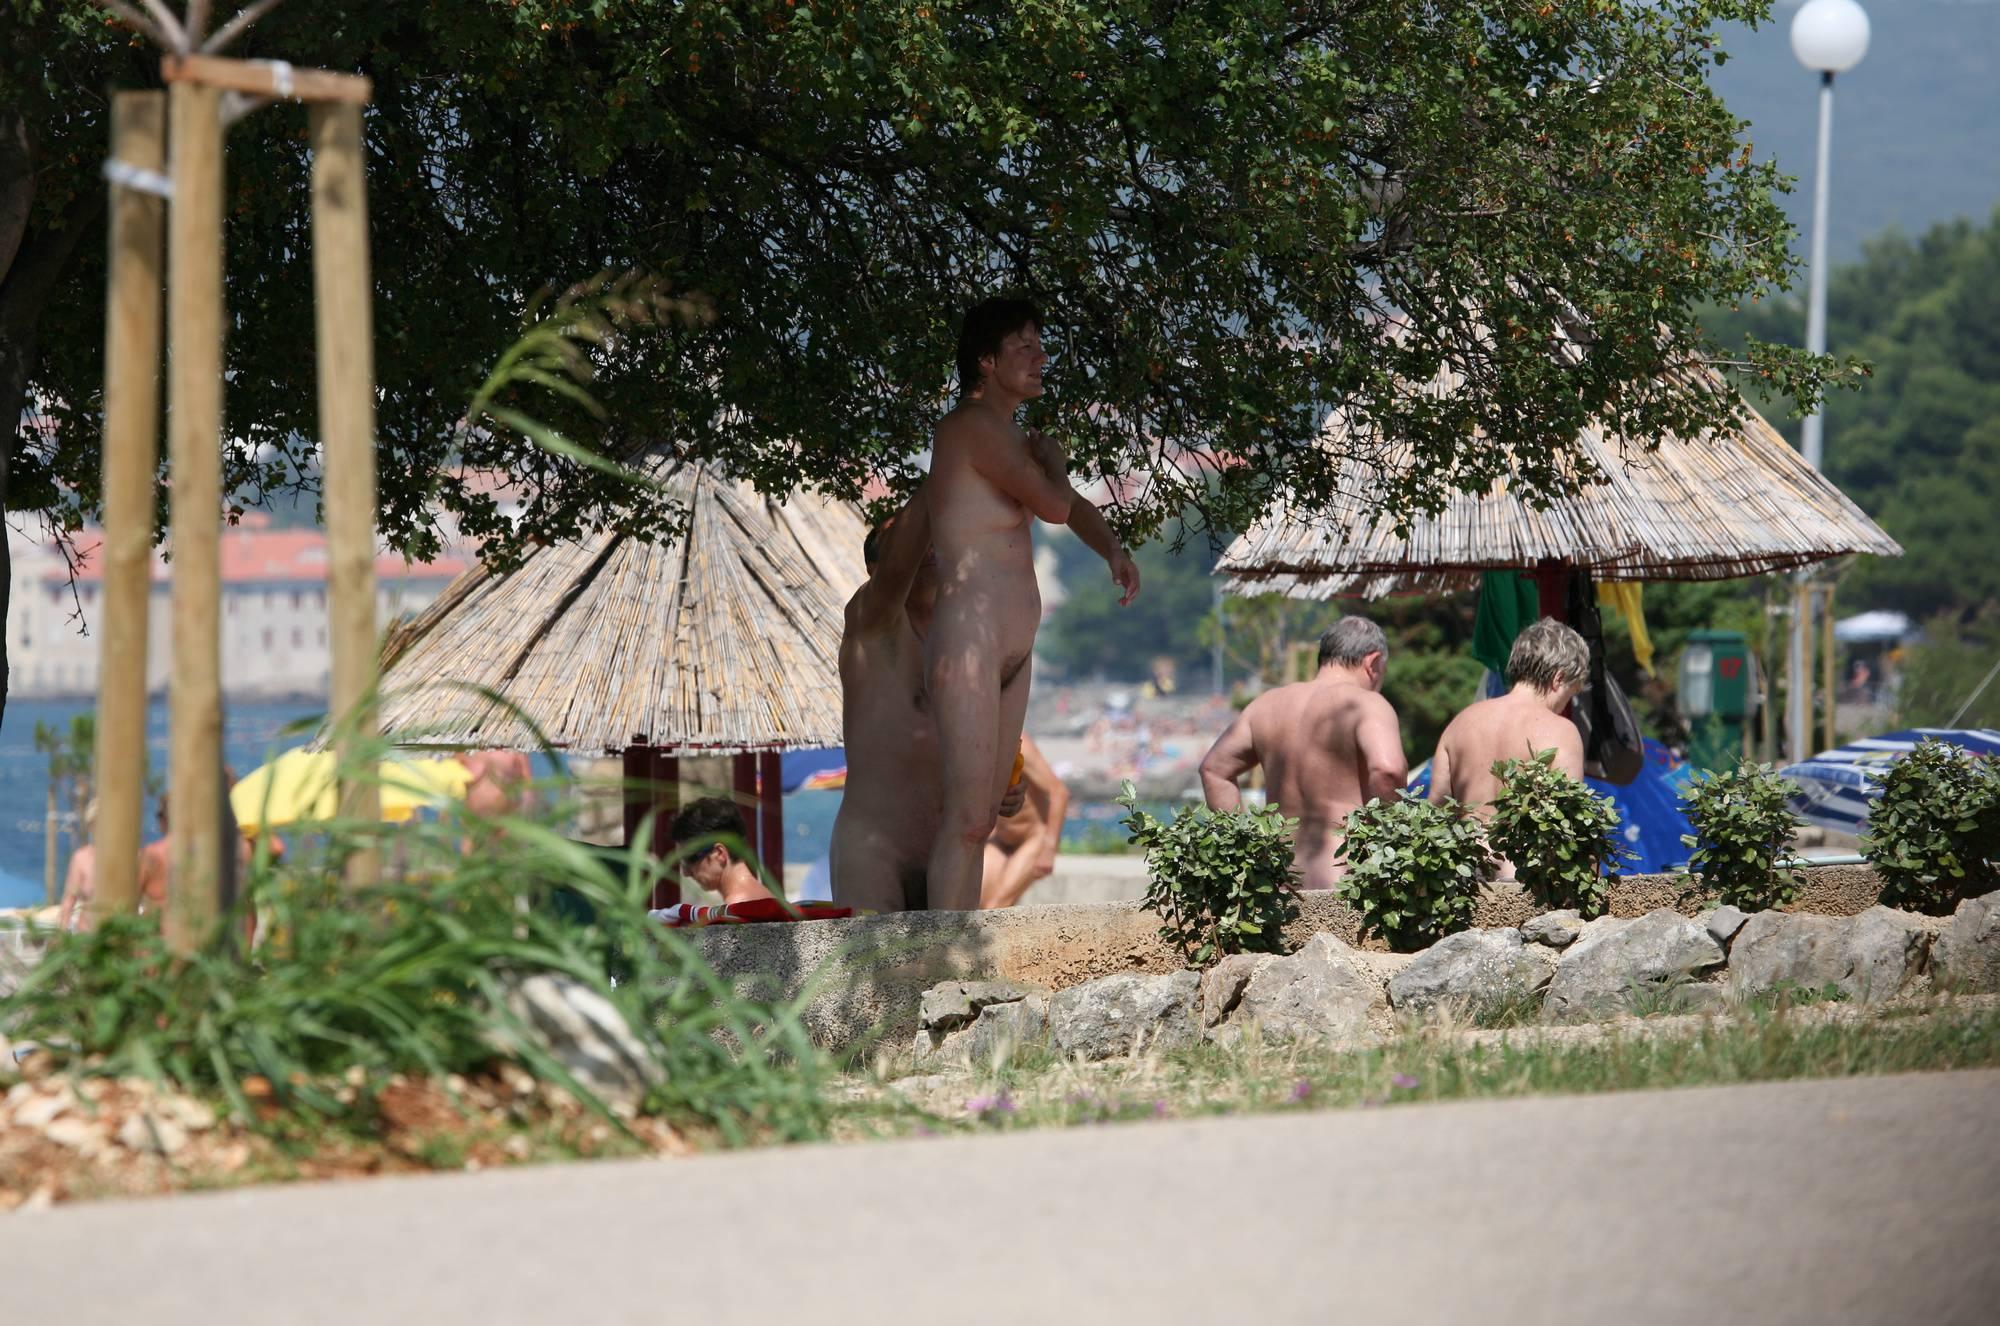 Pure Nudism-Bondi Beach-Park Grounds - 2